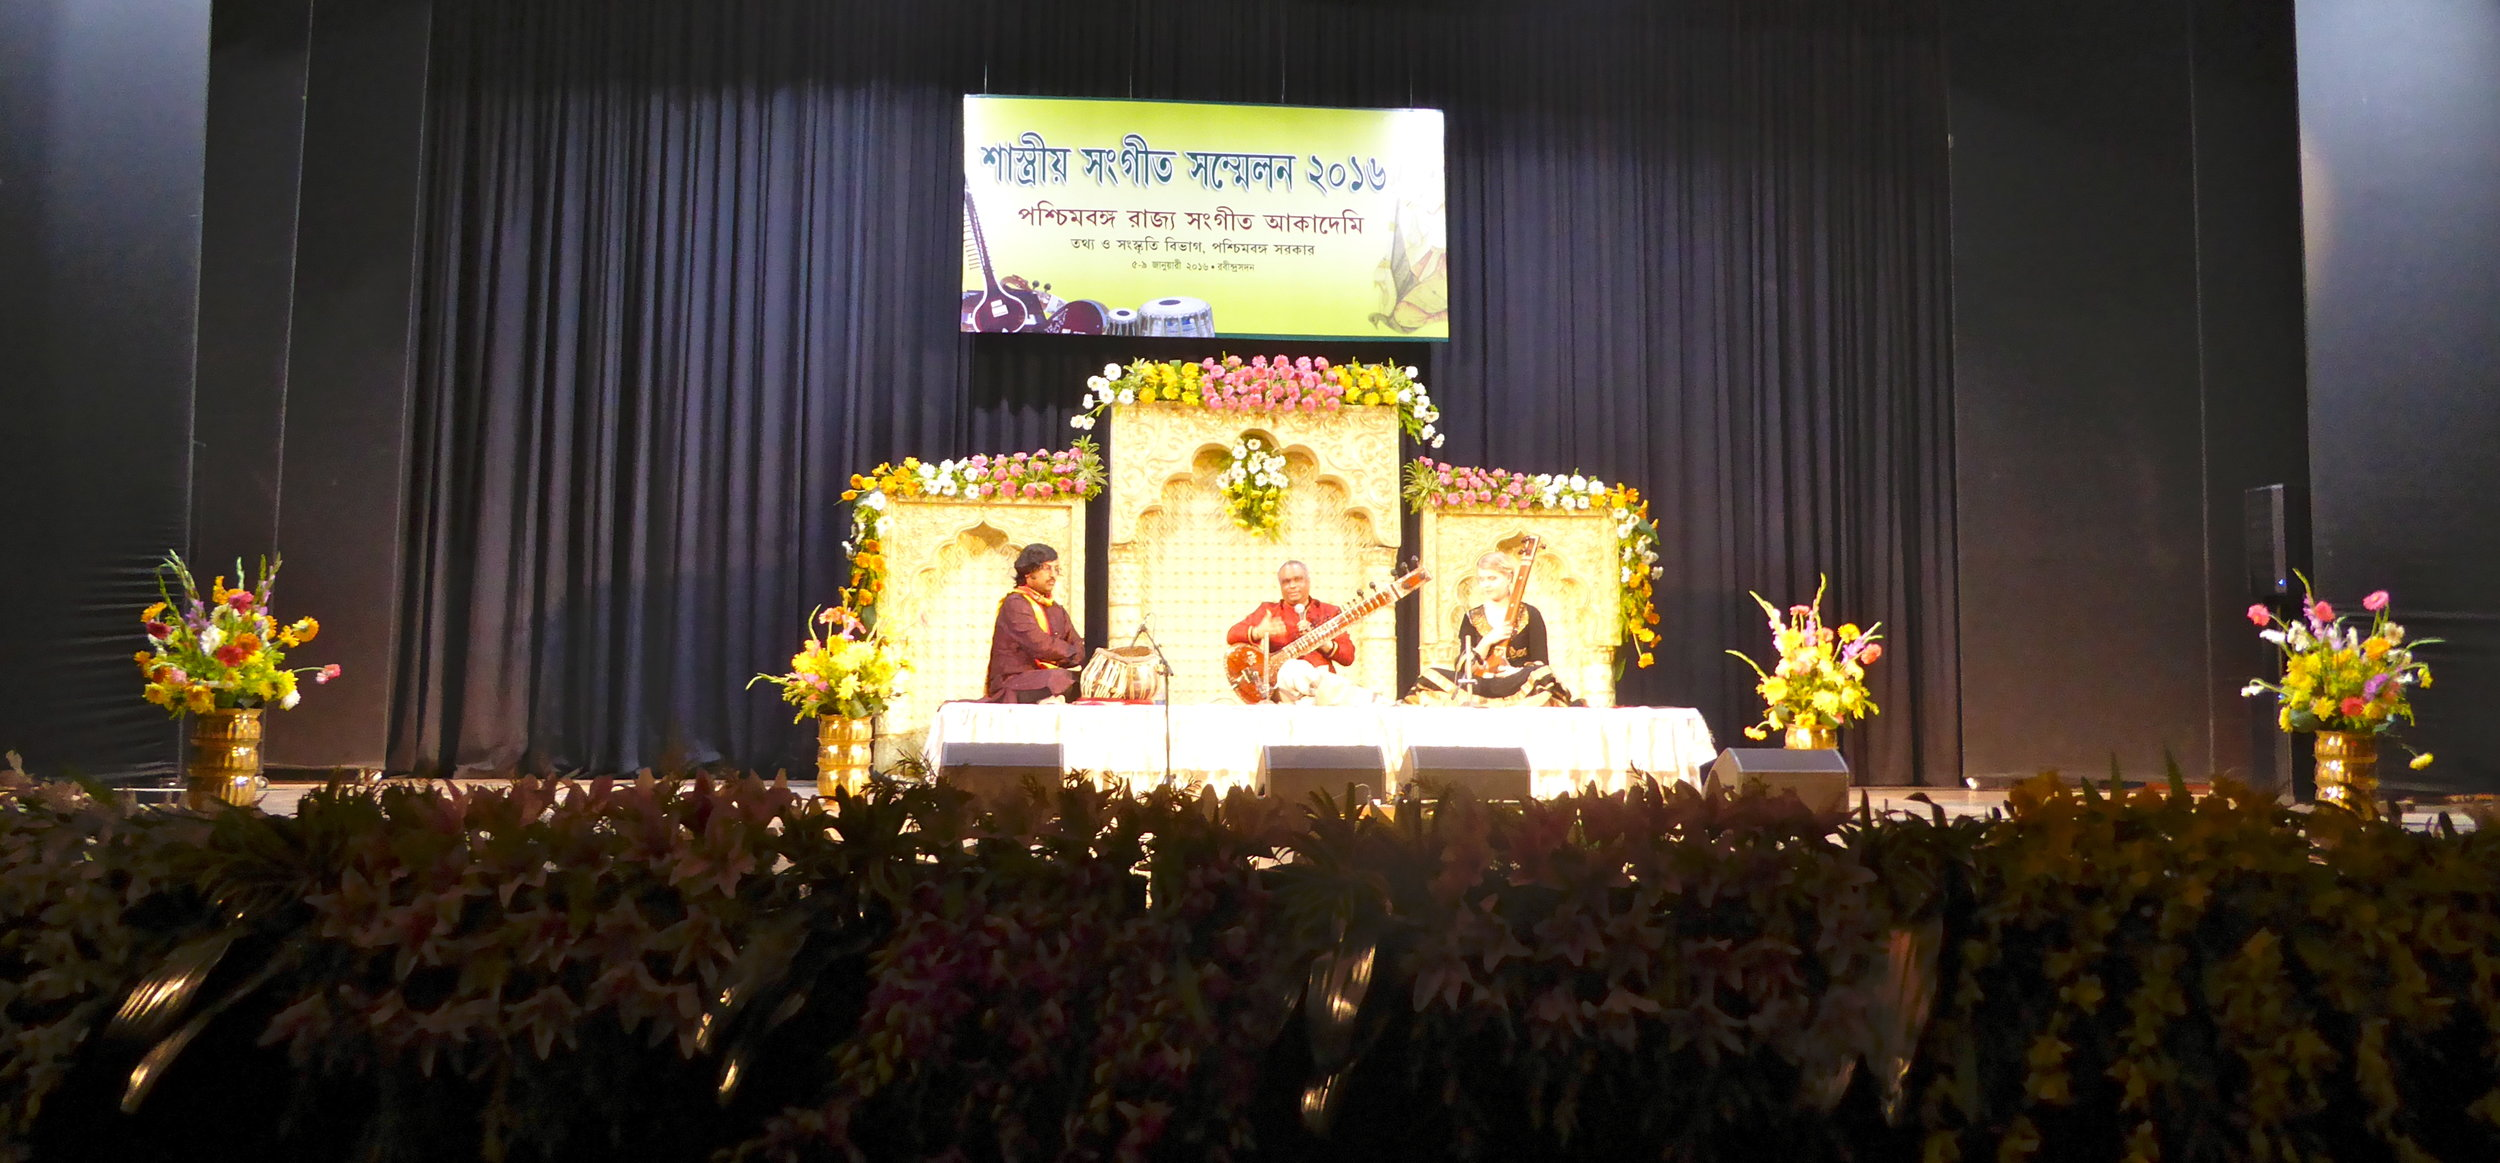 Rajeestan academy music festival. Amit Chatterjee on tablas